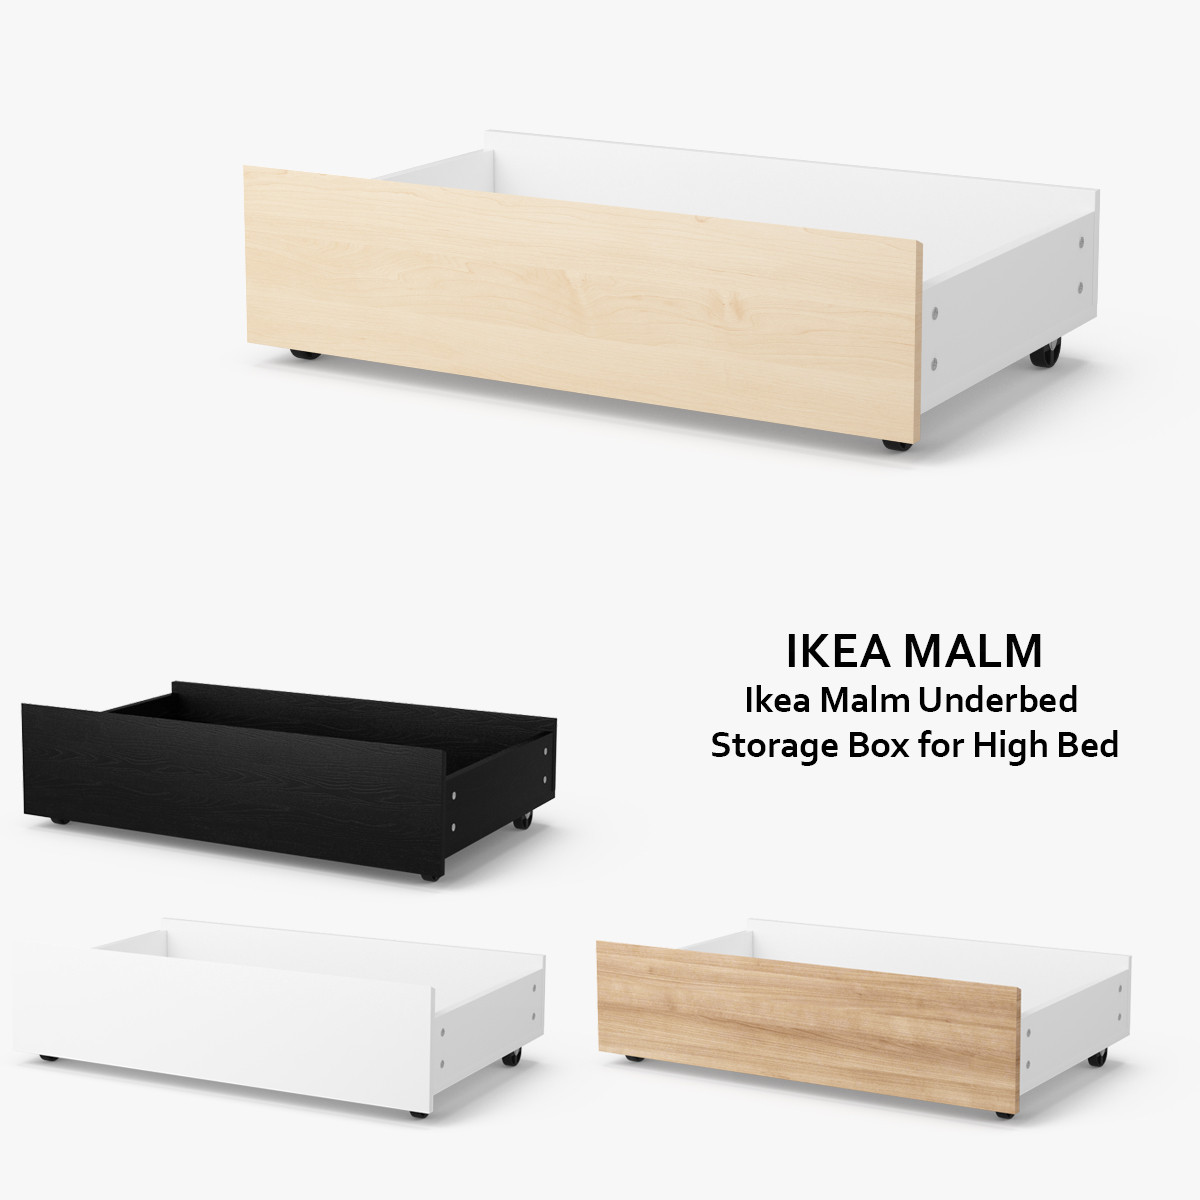 Ikea Drawers Under Bed Storage Nazarmcom  sc 1 st  Listitdallas & Ikea Underbed Storage Drawers - Listitdallas